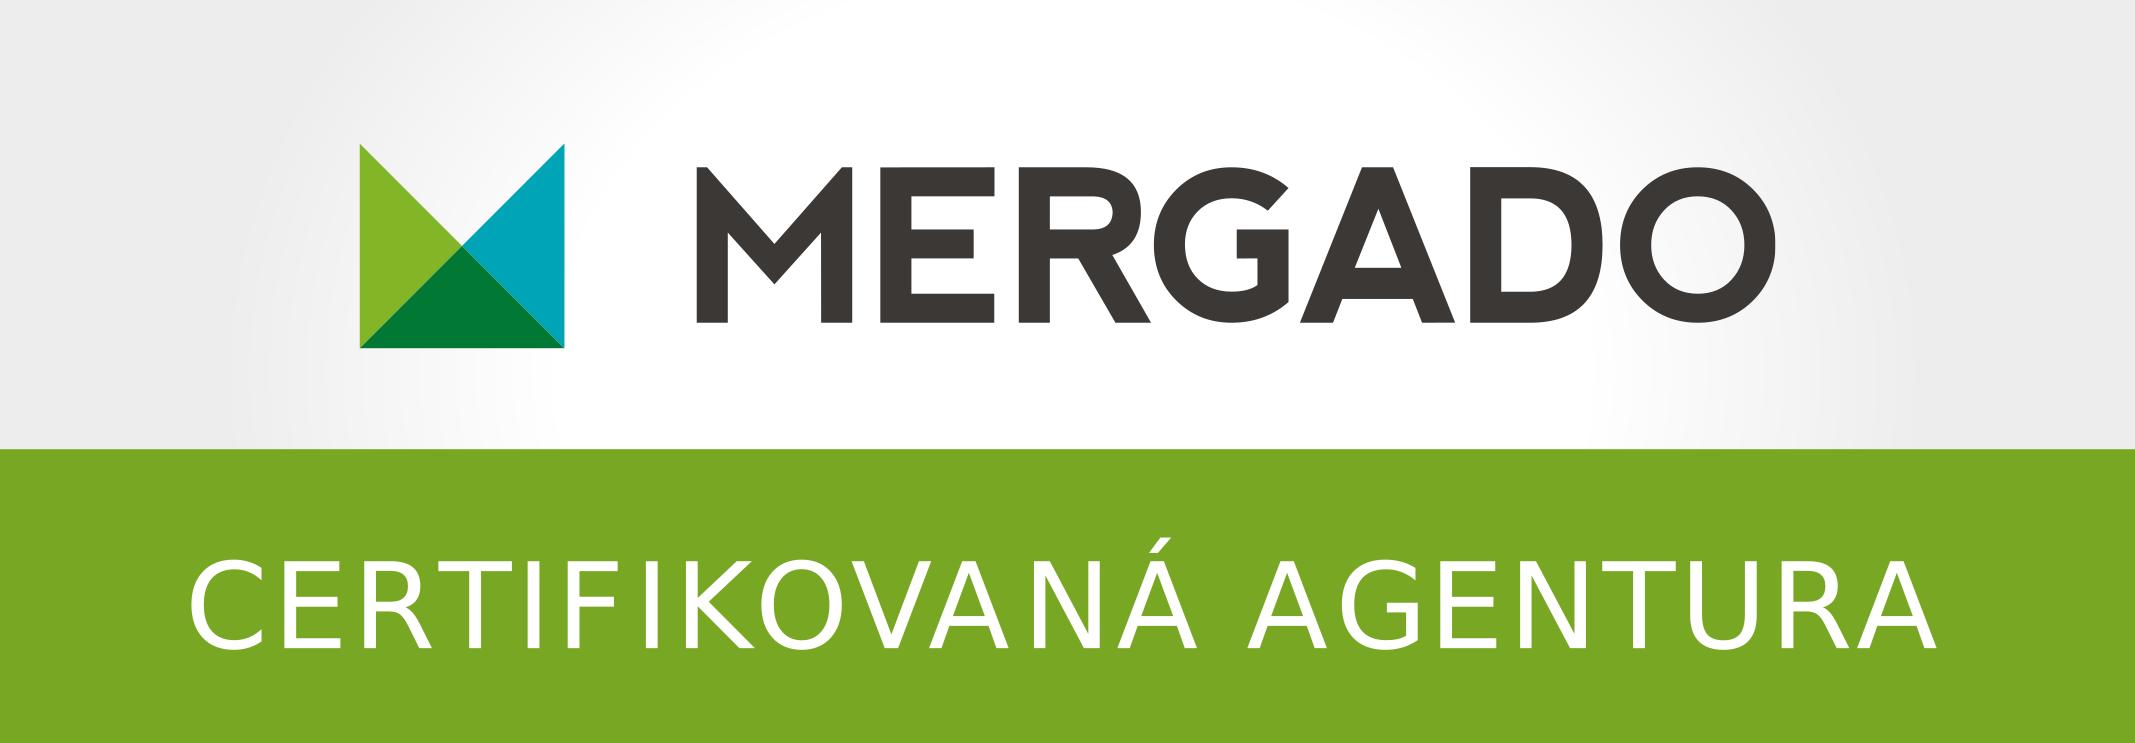 Mergado: Certifikovaná agentura logo – Instinct Agency